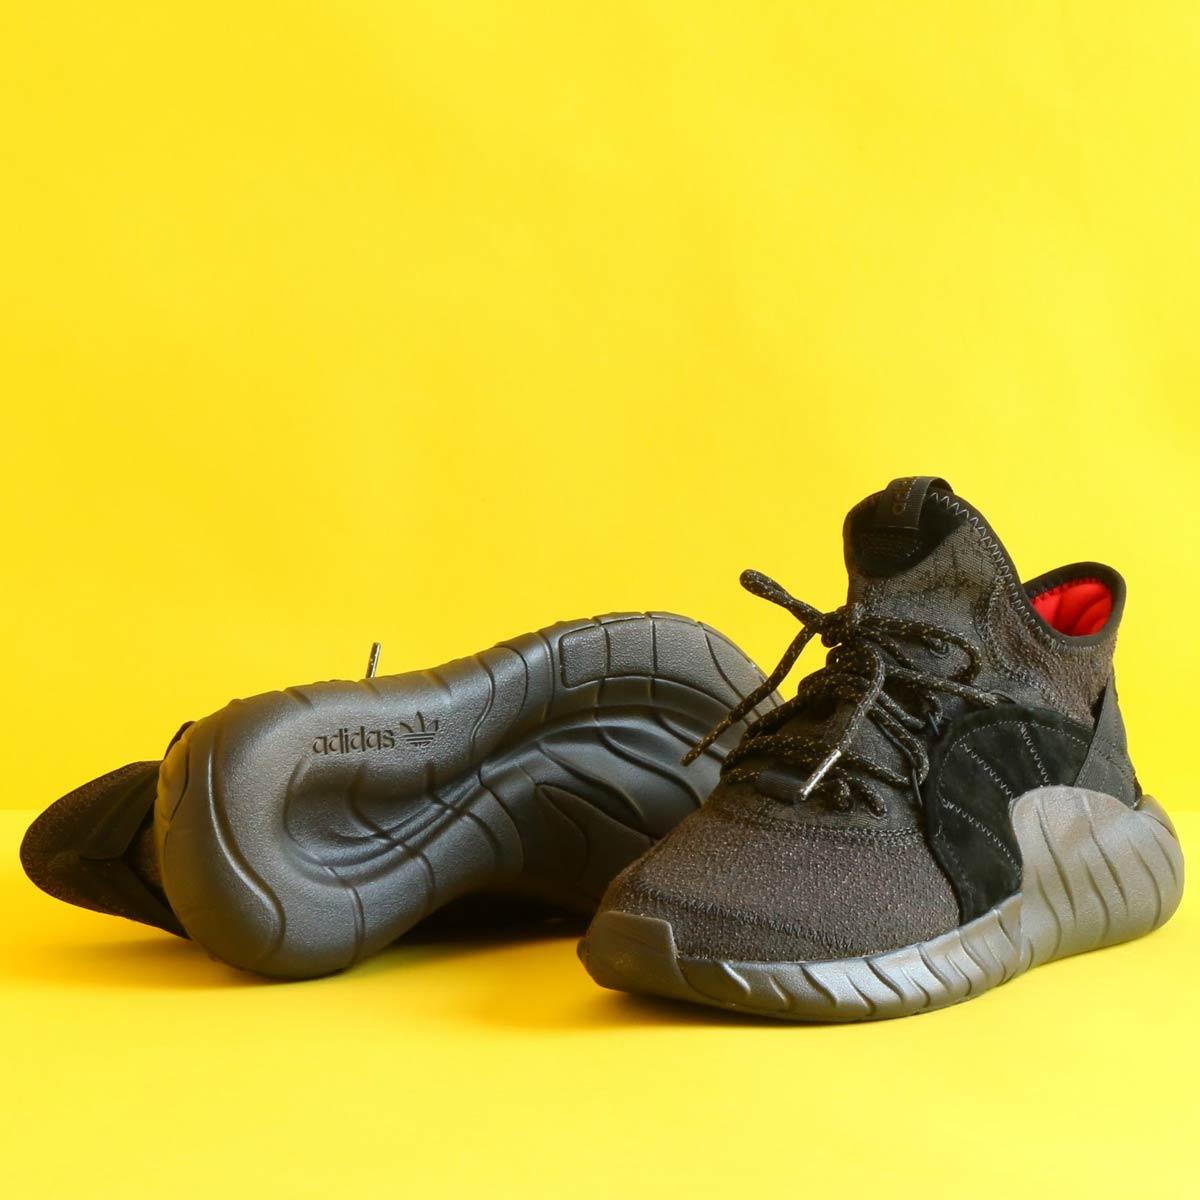 adidas Originals TUBULARRISE (アディダス オリジナルス チュブラーライズ)Core Black/Core Black/Core Red【メンズ スニーカー】17FW-S